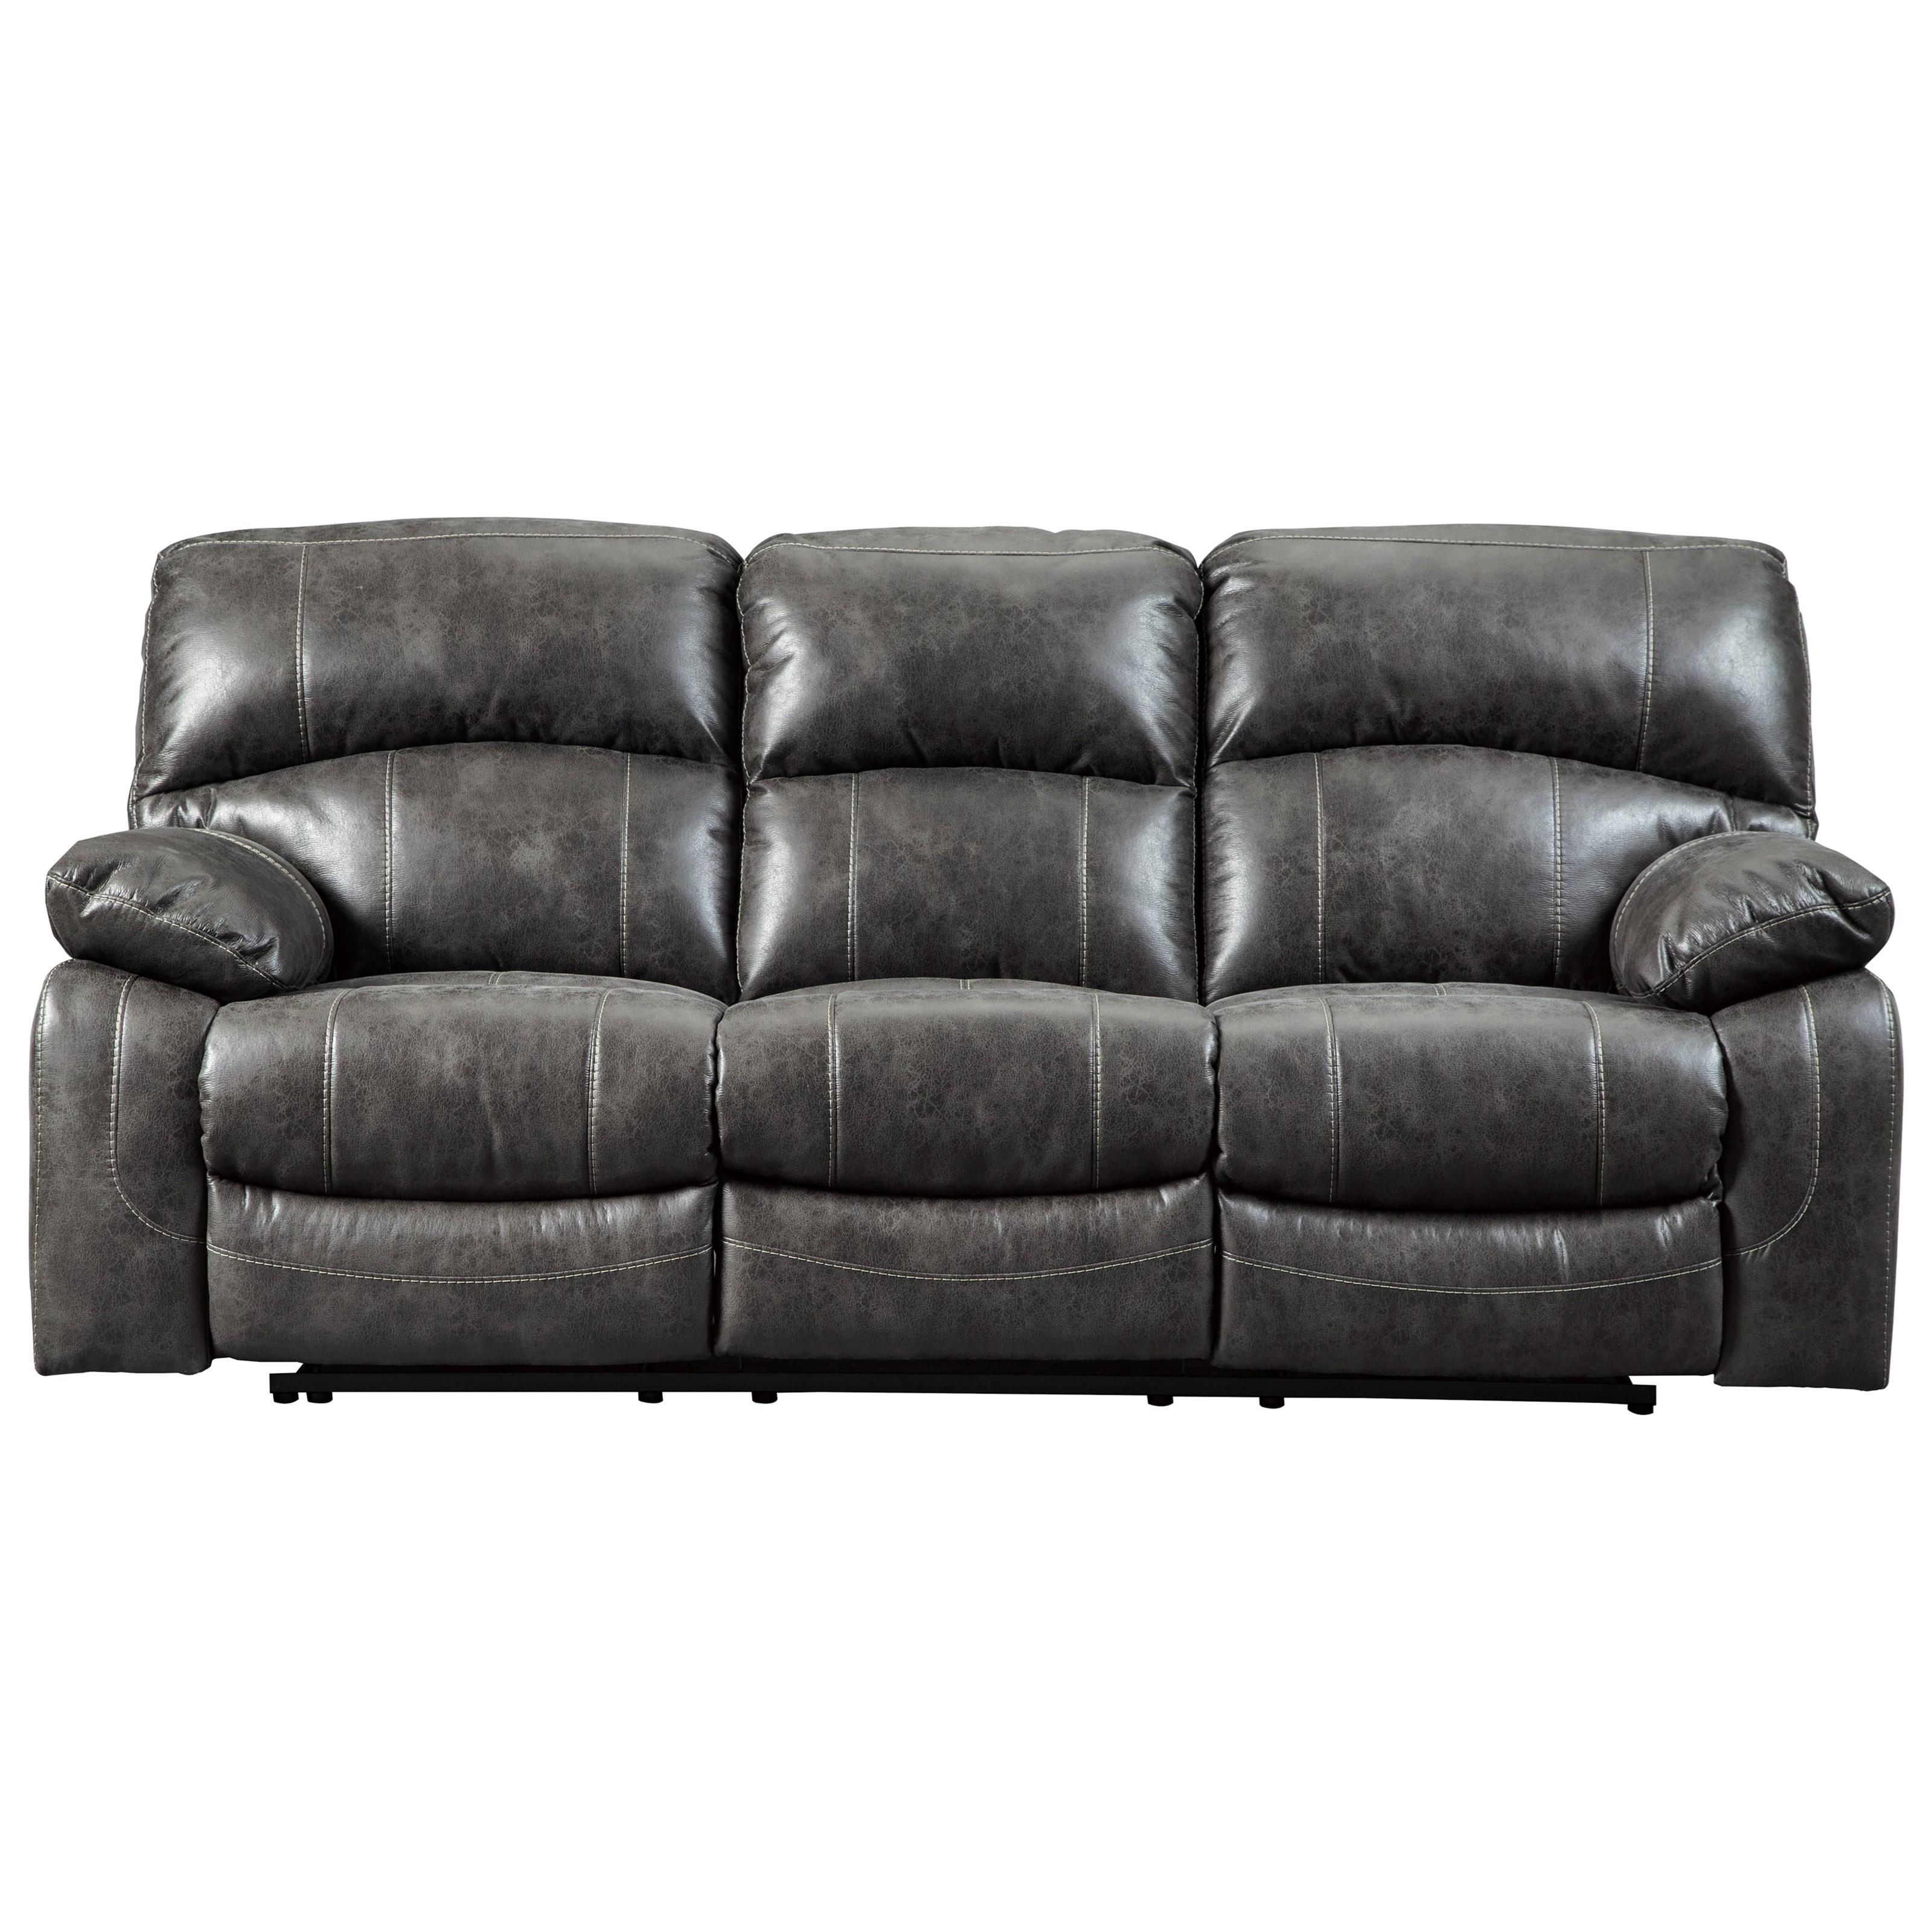 grey power reclining sofa rolf benz freistil 186 signature design by ashley dunwell 5160115 faux leather dunwellpower w adjustable headrests